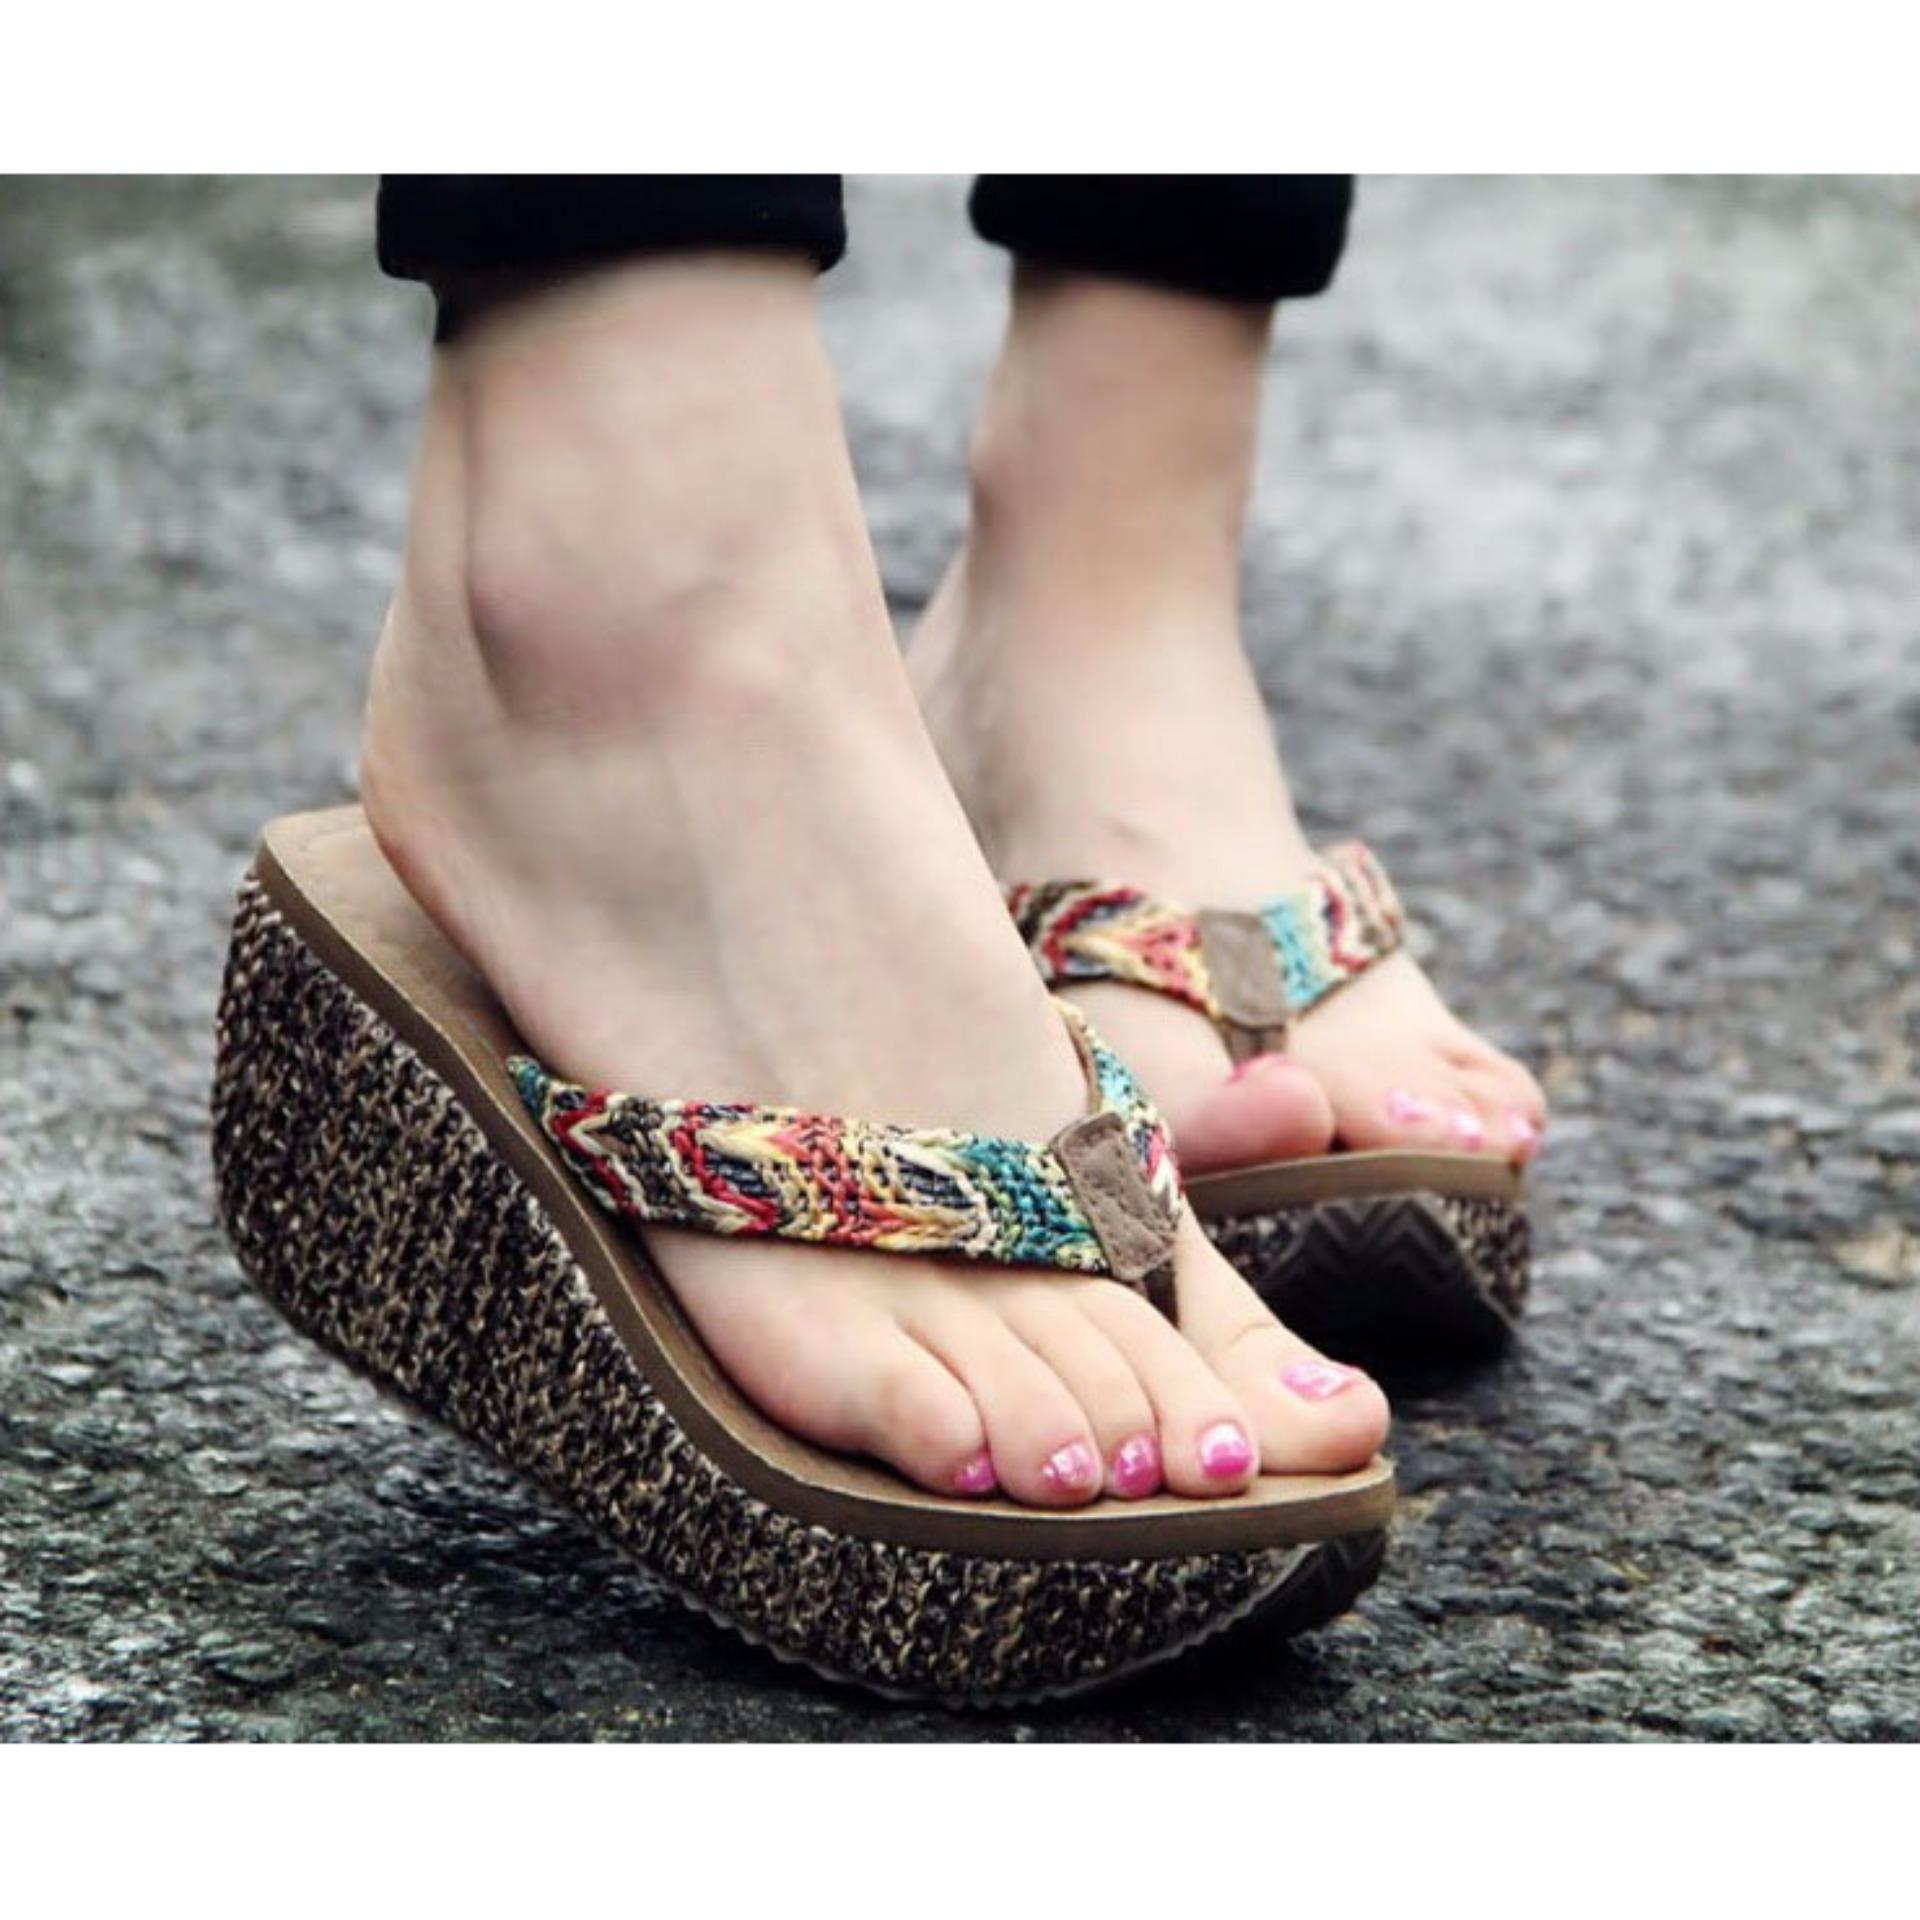 Women Summer Flip Flops Toe Clip Heel 7Cm Rafi Grass Weaving Wedged Sandals Size 35 39 Oem Discount